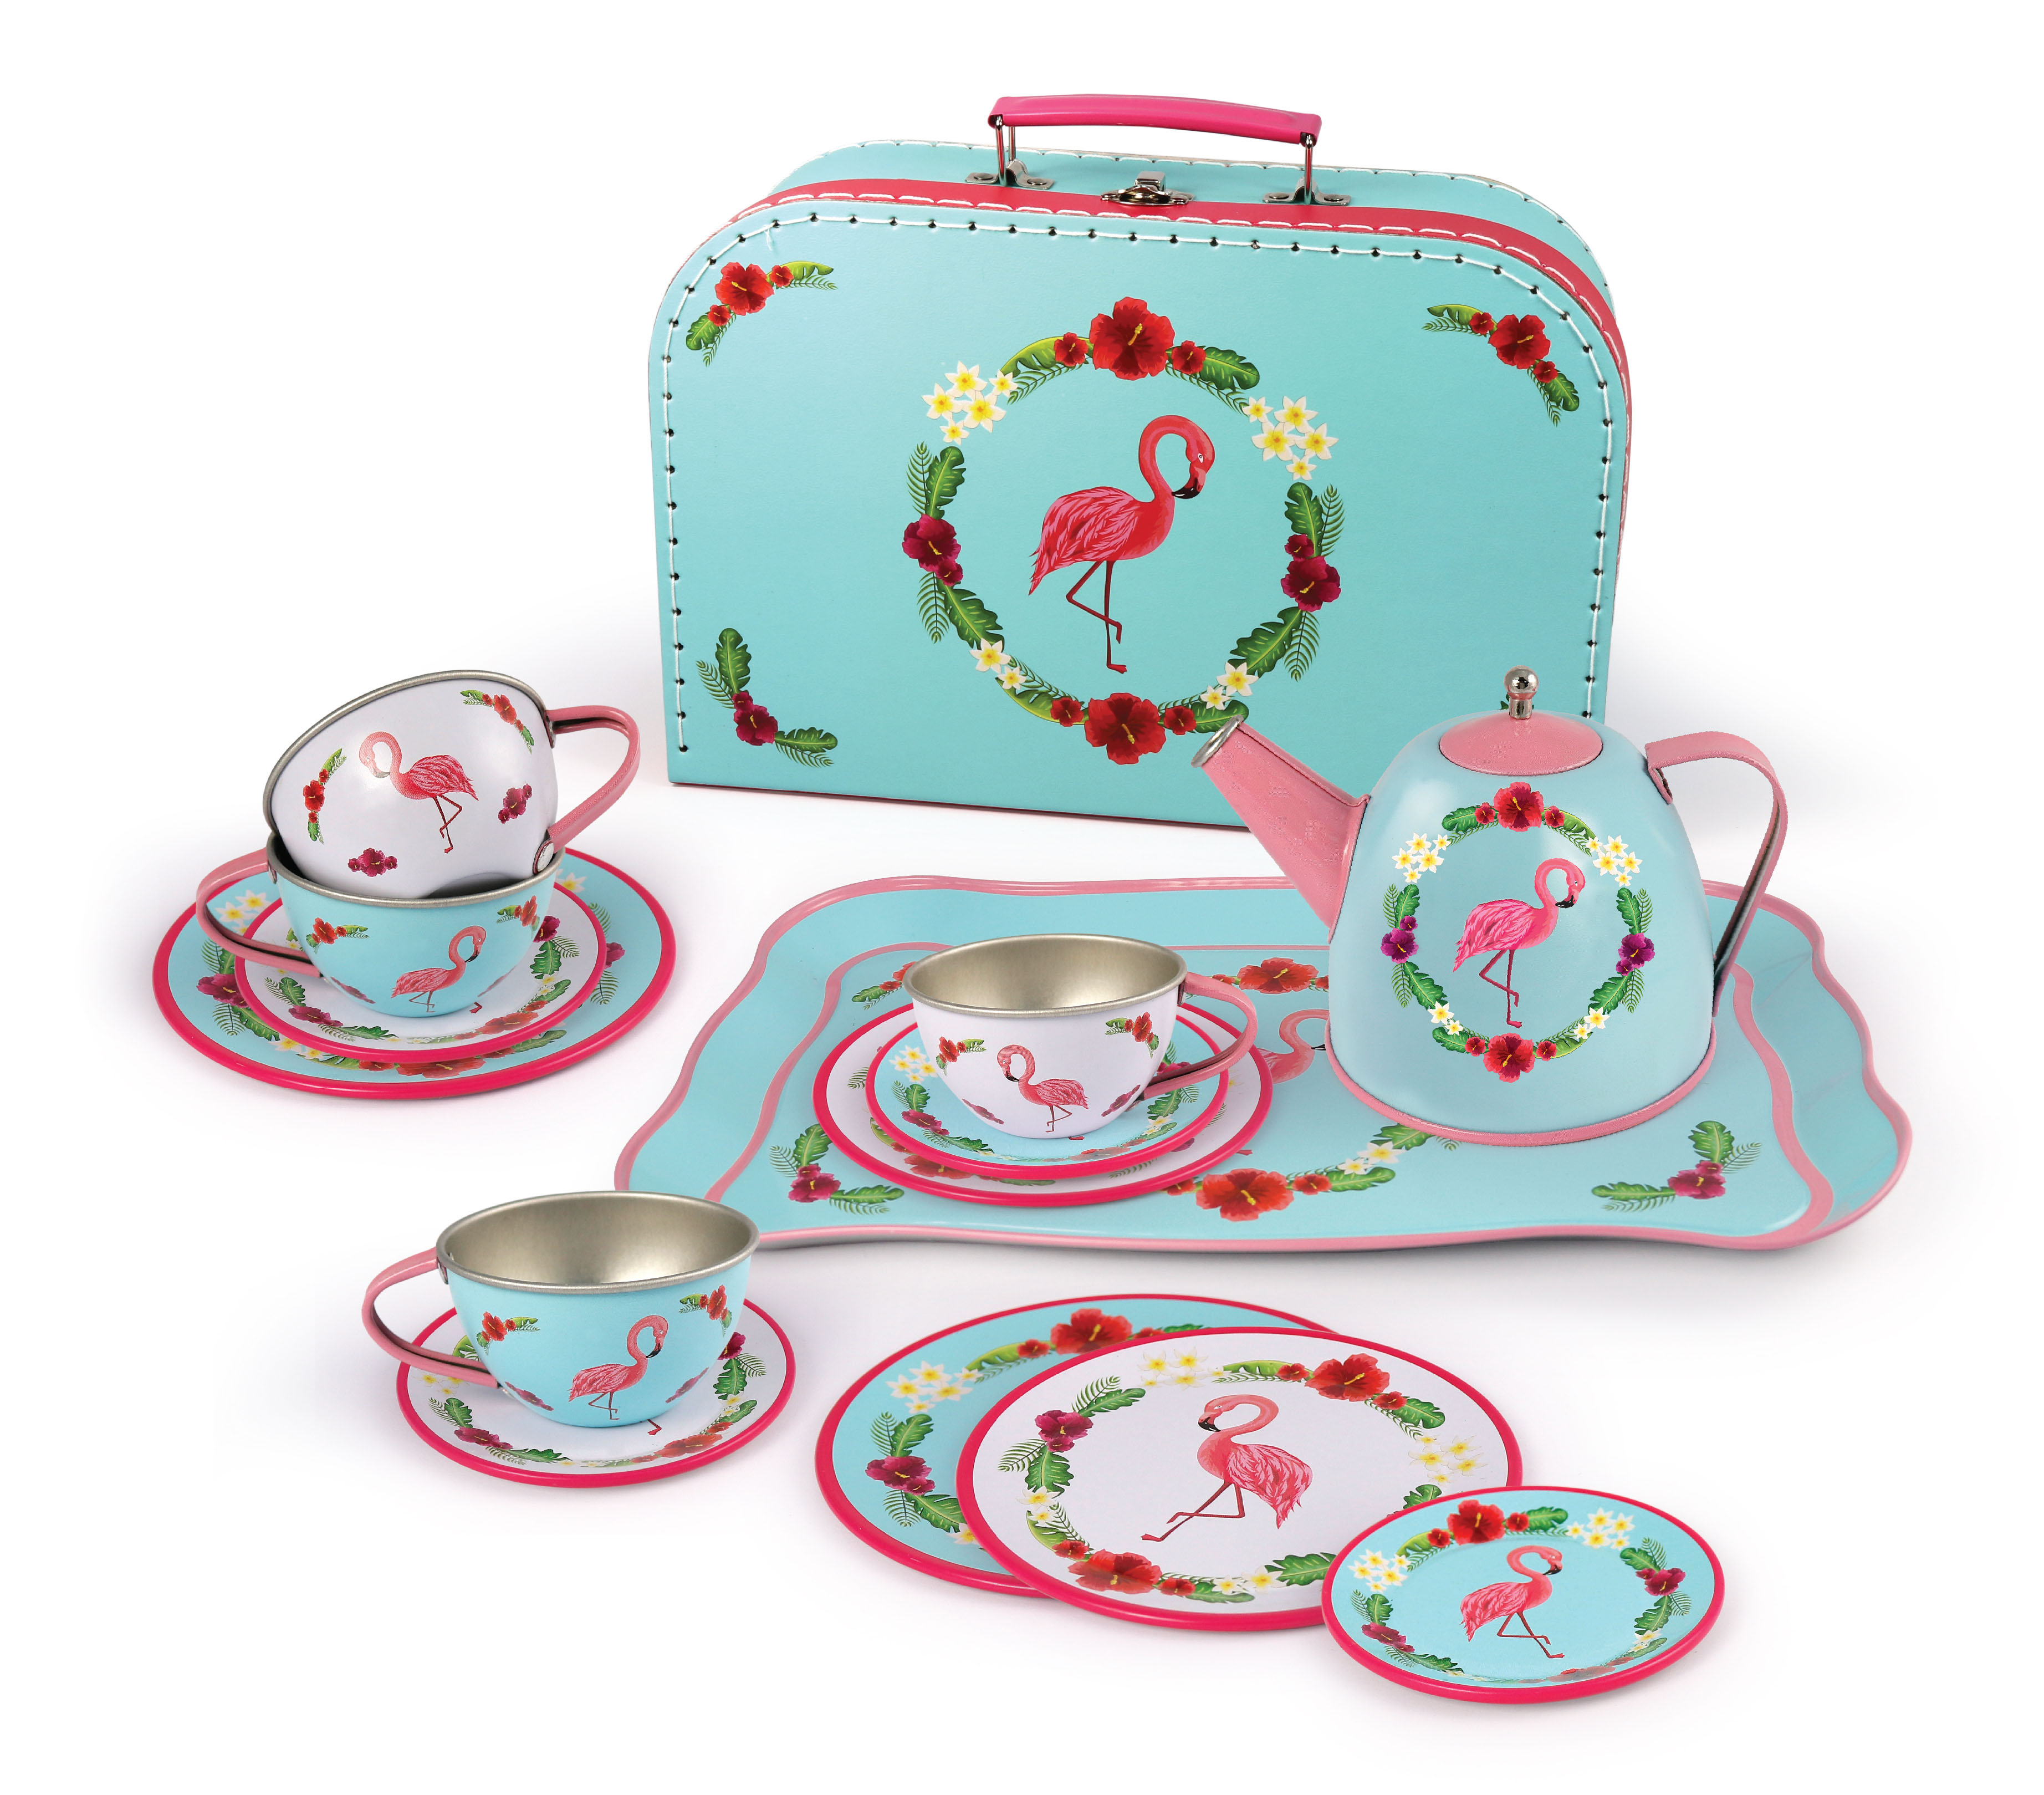 Magni - Tea set Flamingo in tin, 15 pcs (2940)